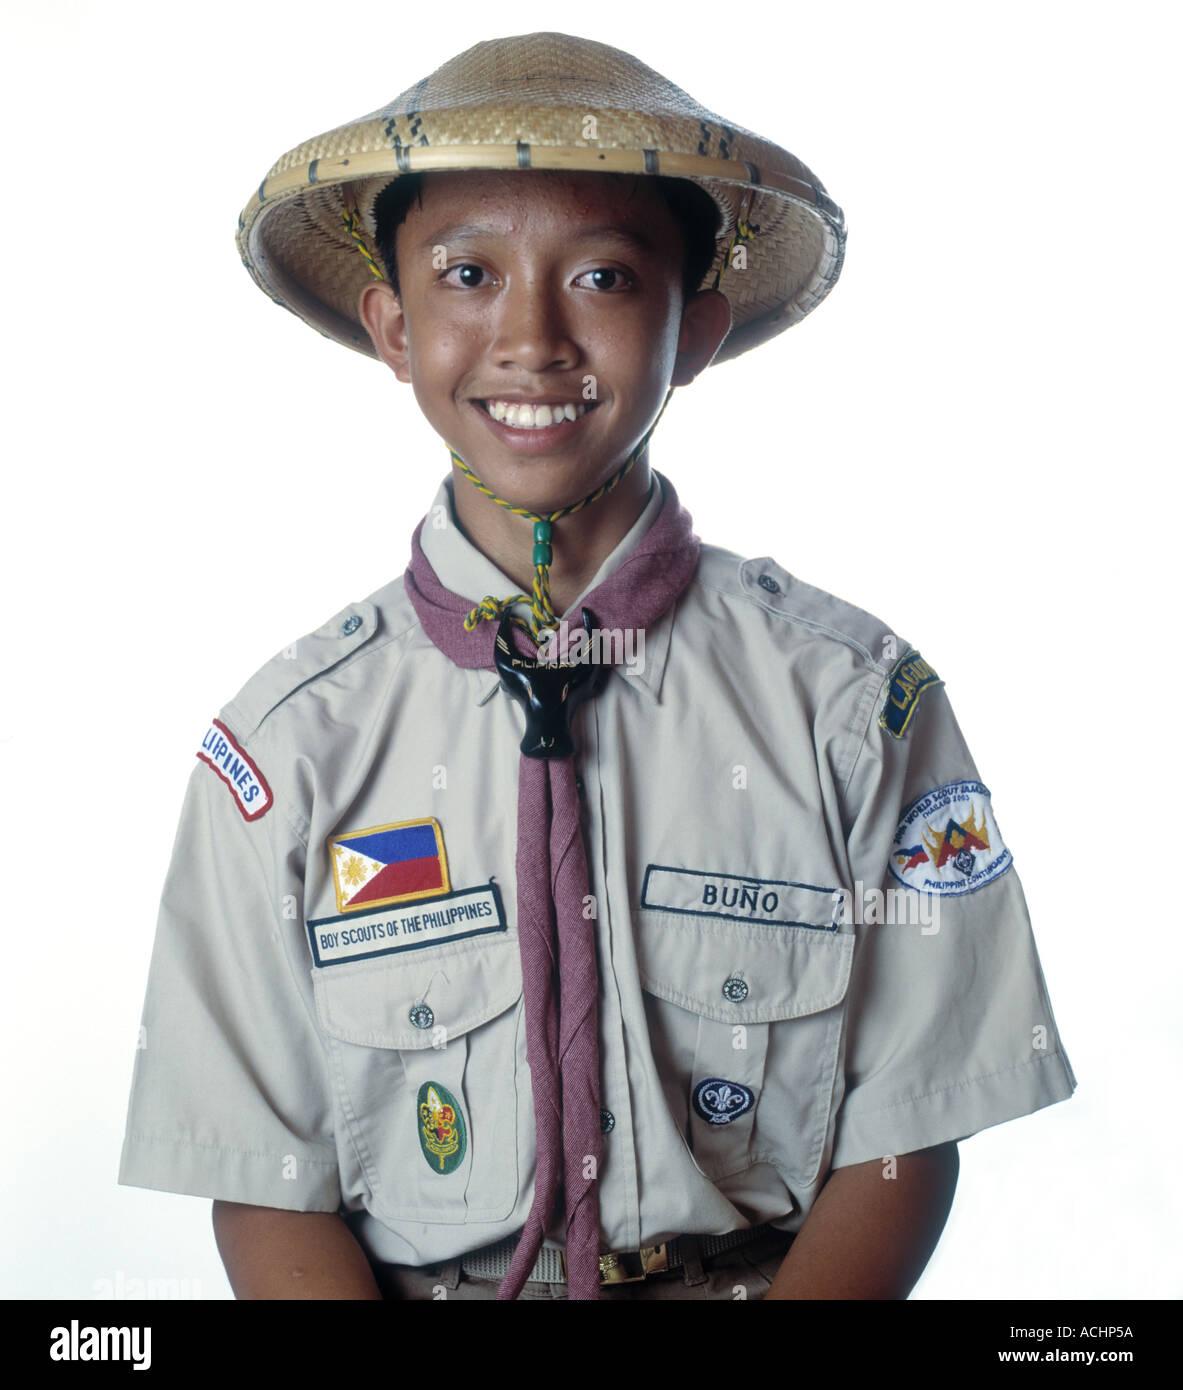 Boy Scout Uniform Where To Buy Philippines | RLDM